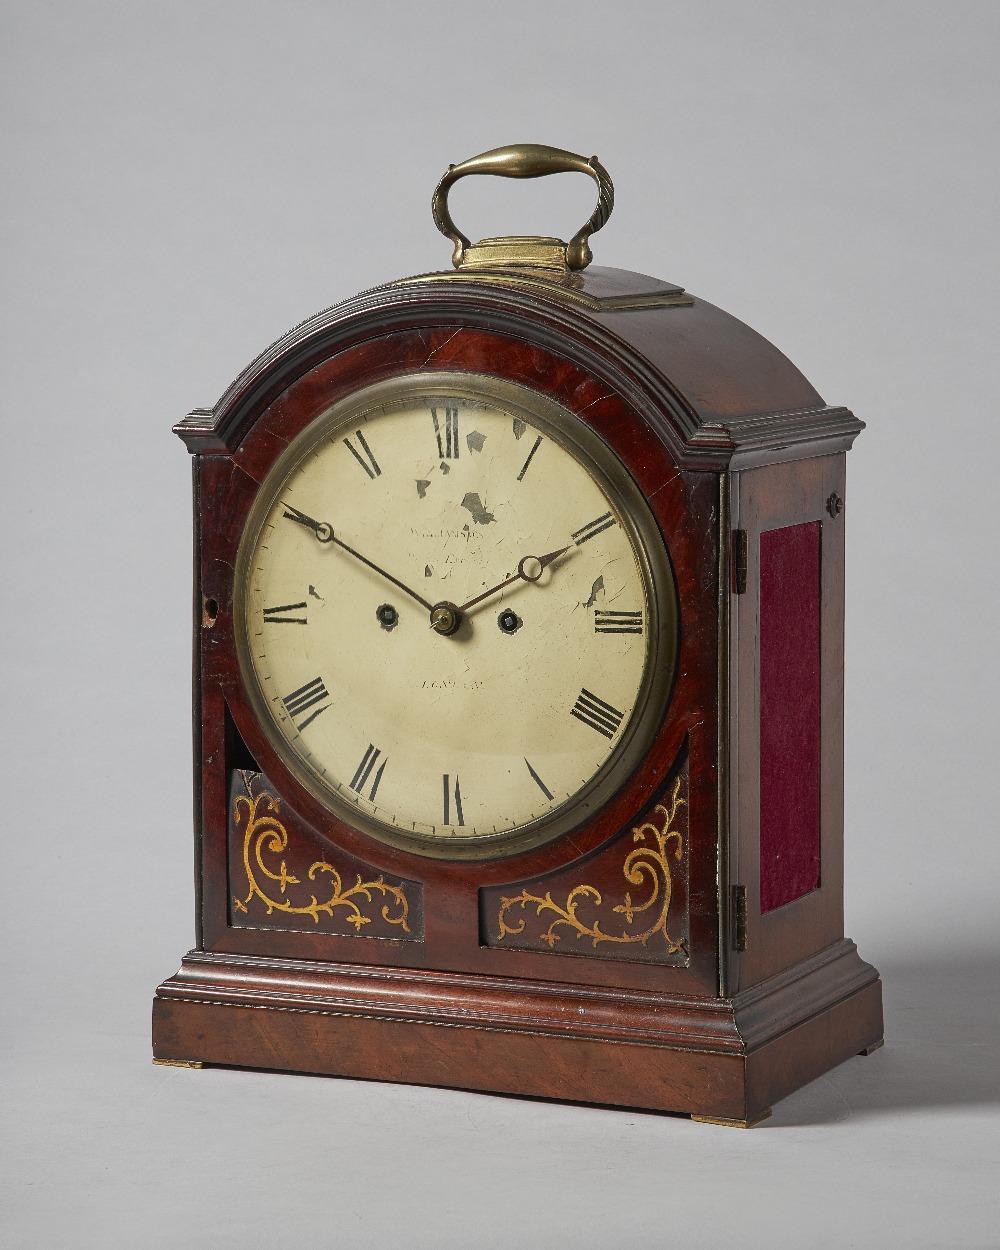 Lot 657 - A George III brass-mounted mahogany striking bracket clock By Williamson, Royal Exchange,